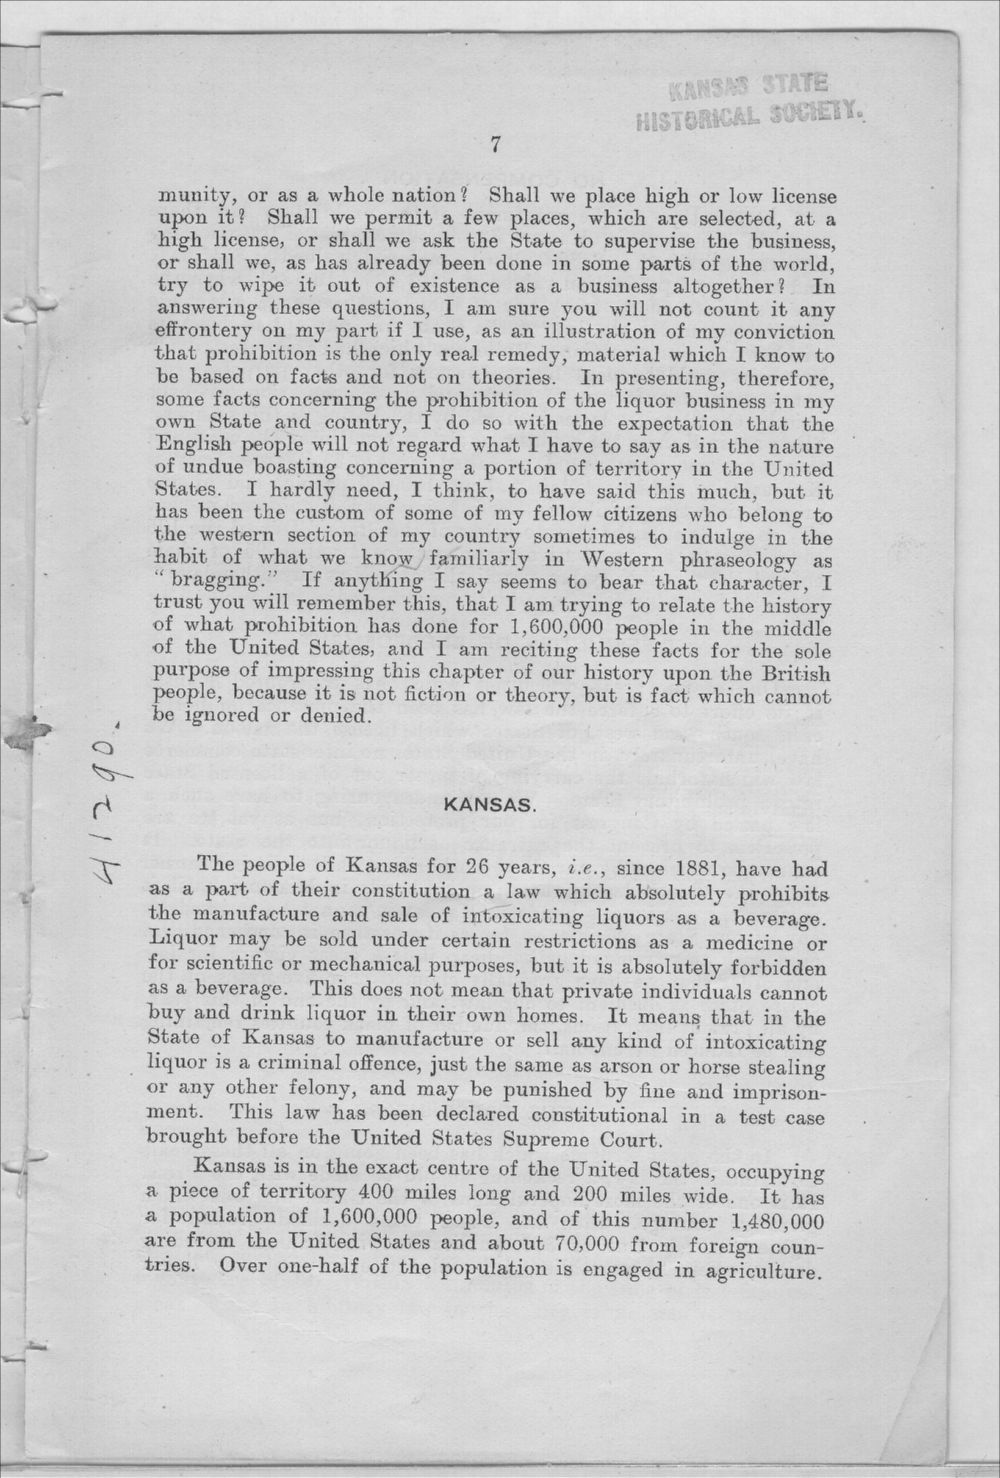 Prohibition in Kansas, U.S.A. - 7